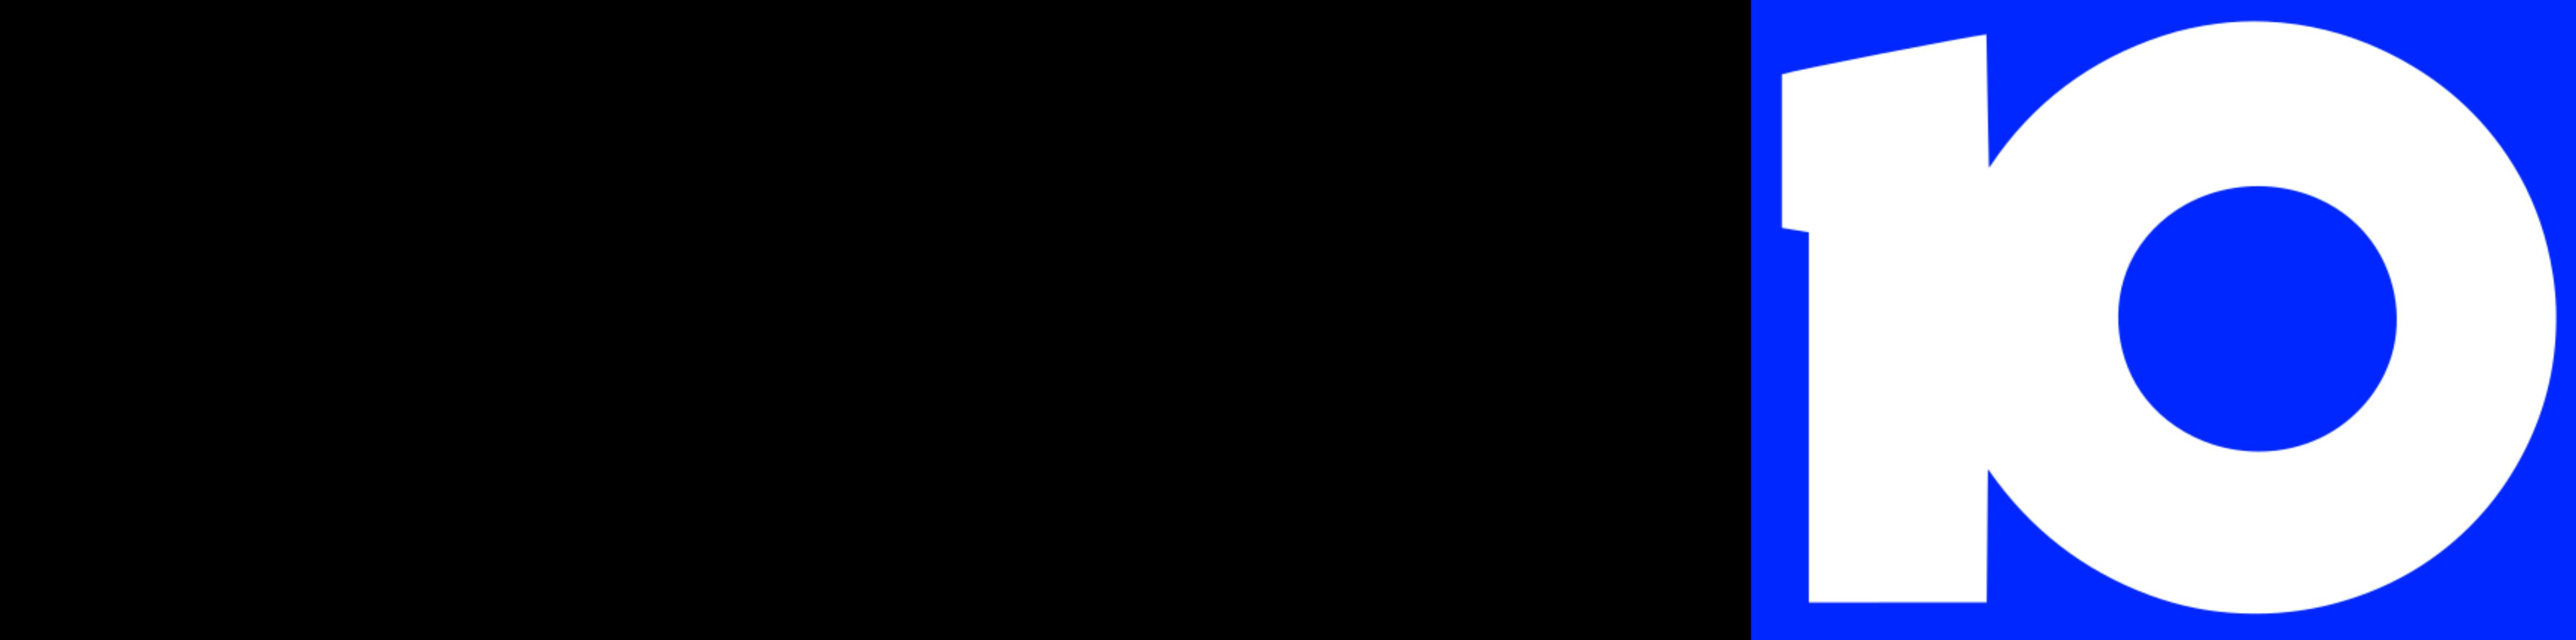 AlternateHistory.com's WTEN logo #1.png